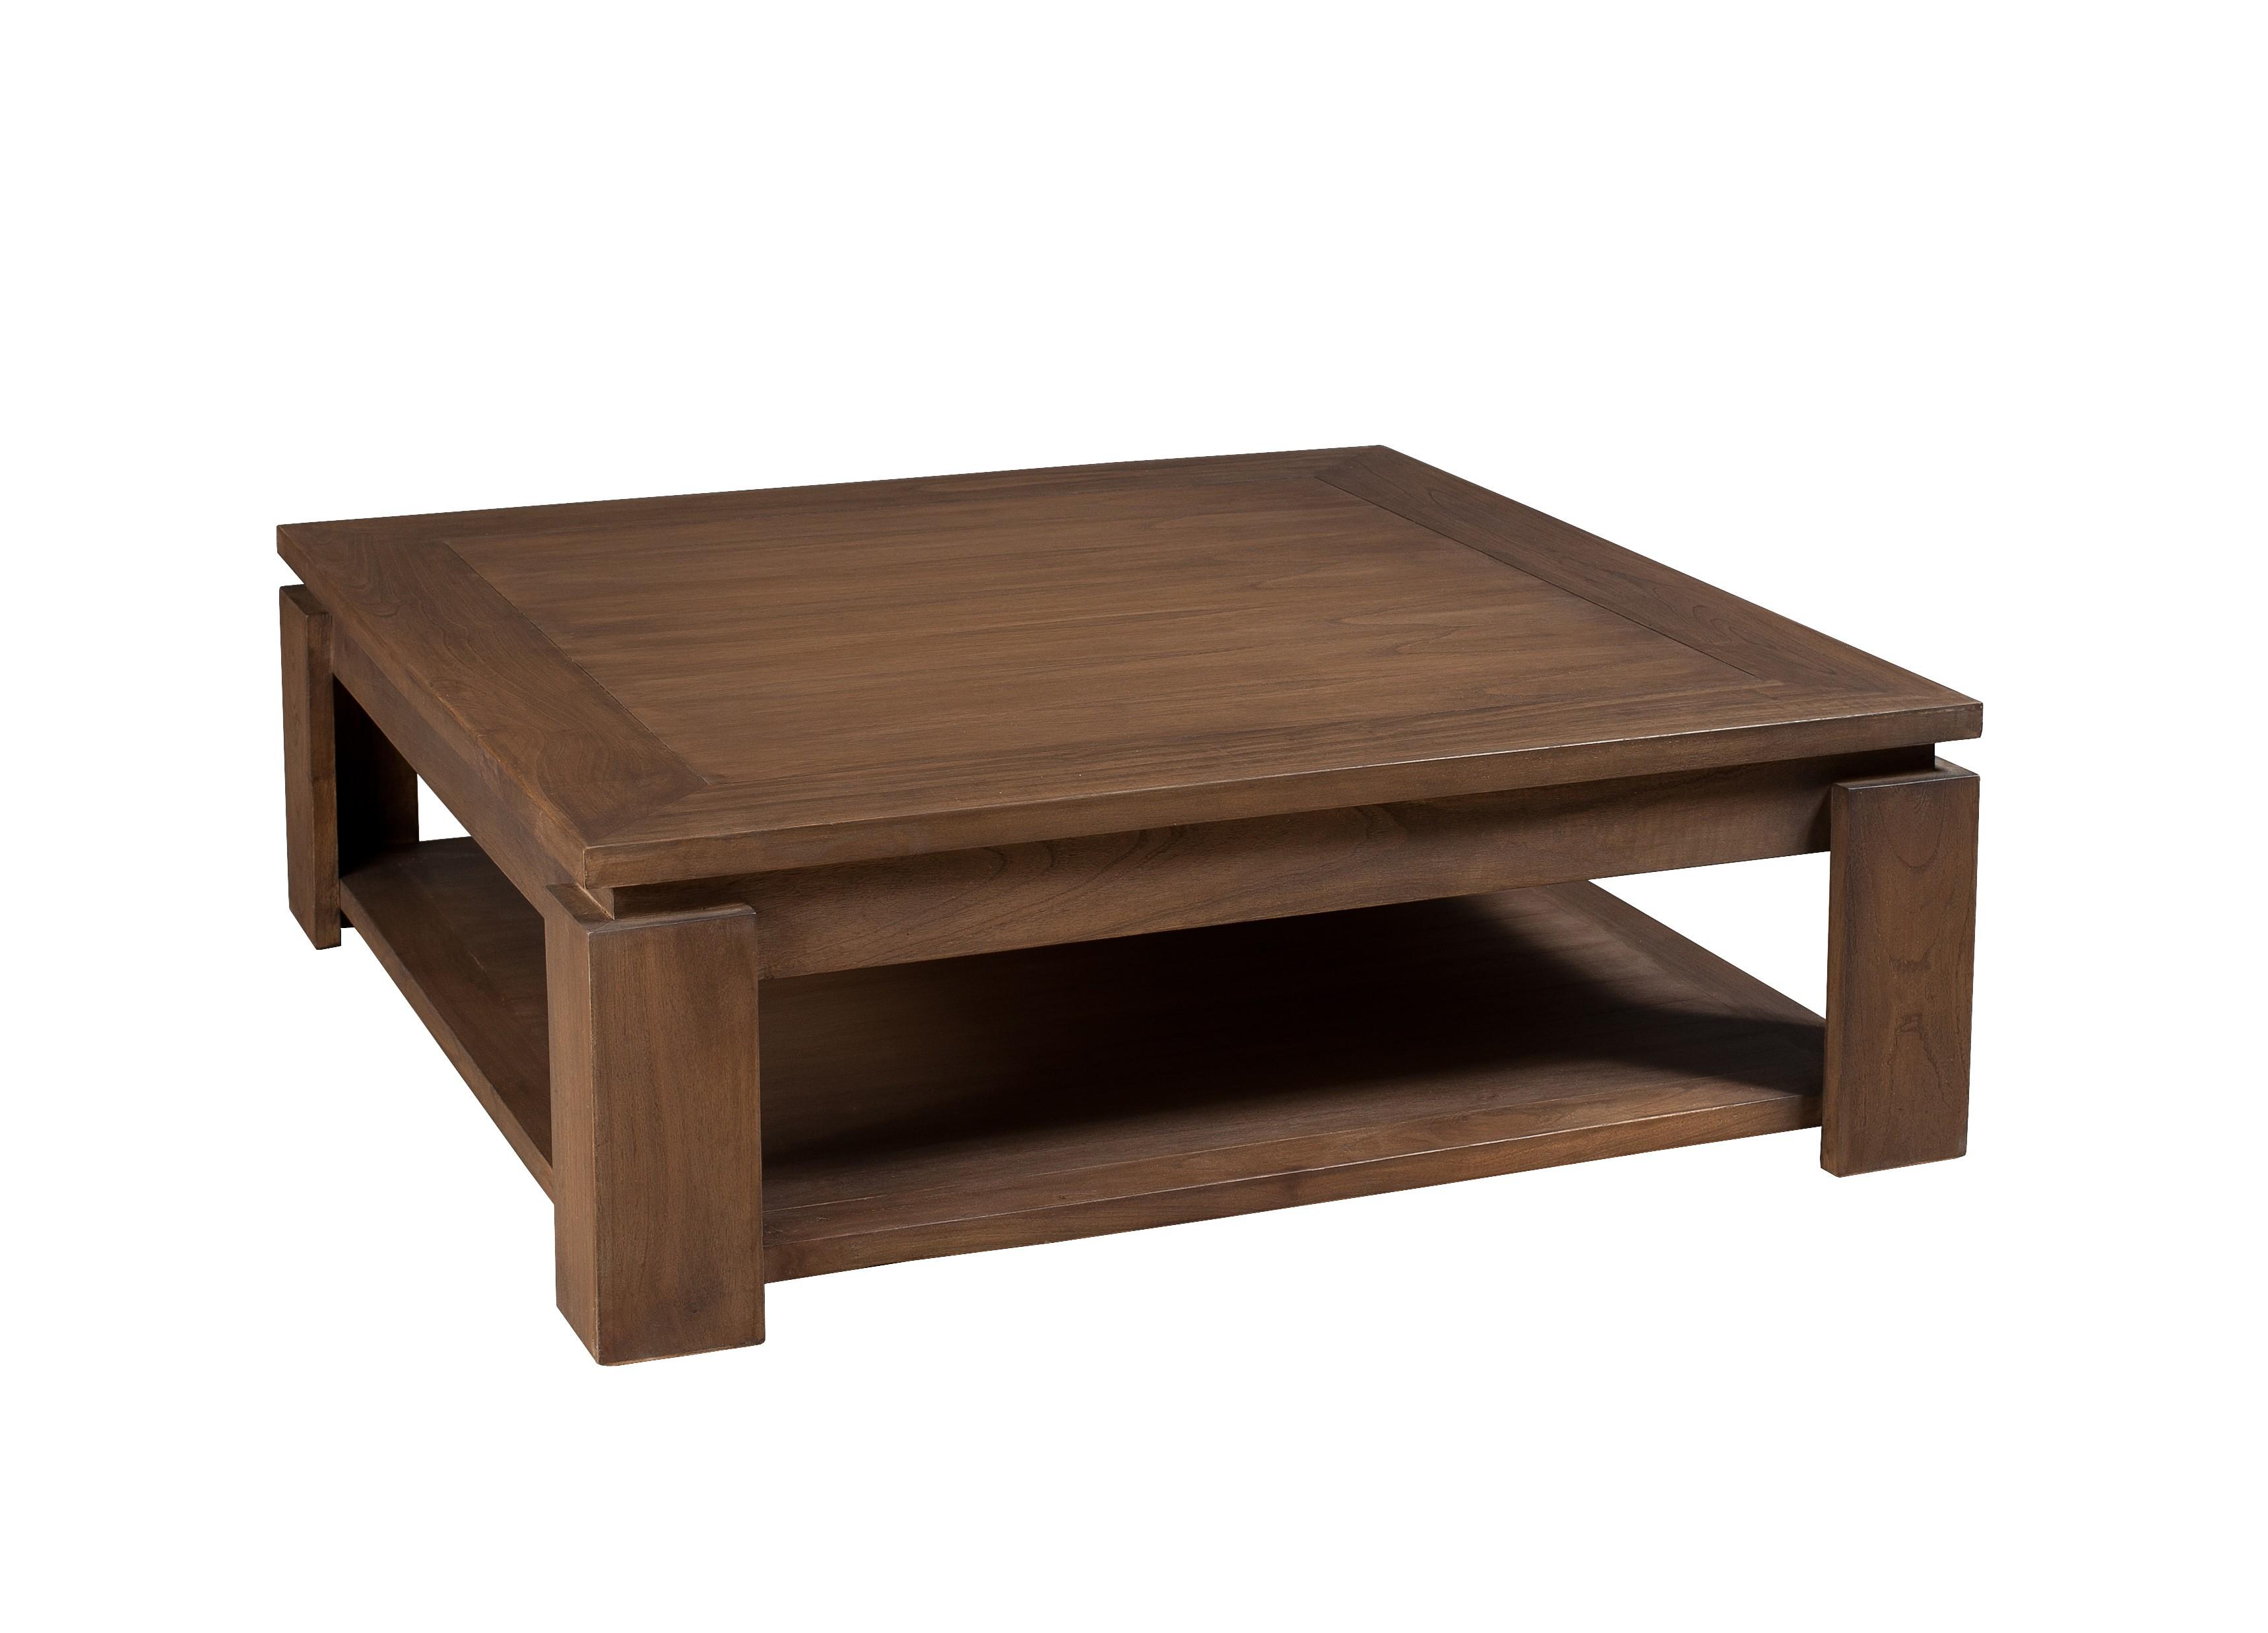 Table De Salon Carree.Table Basse Carree Bois Exotique Louna